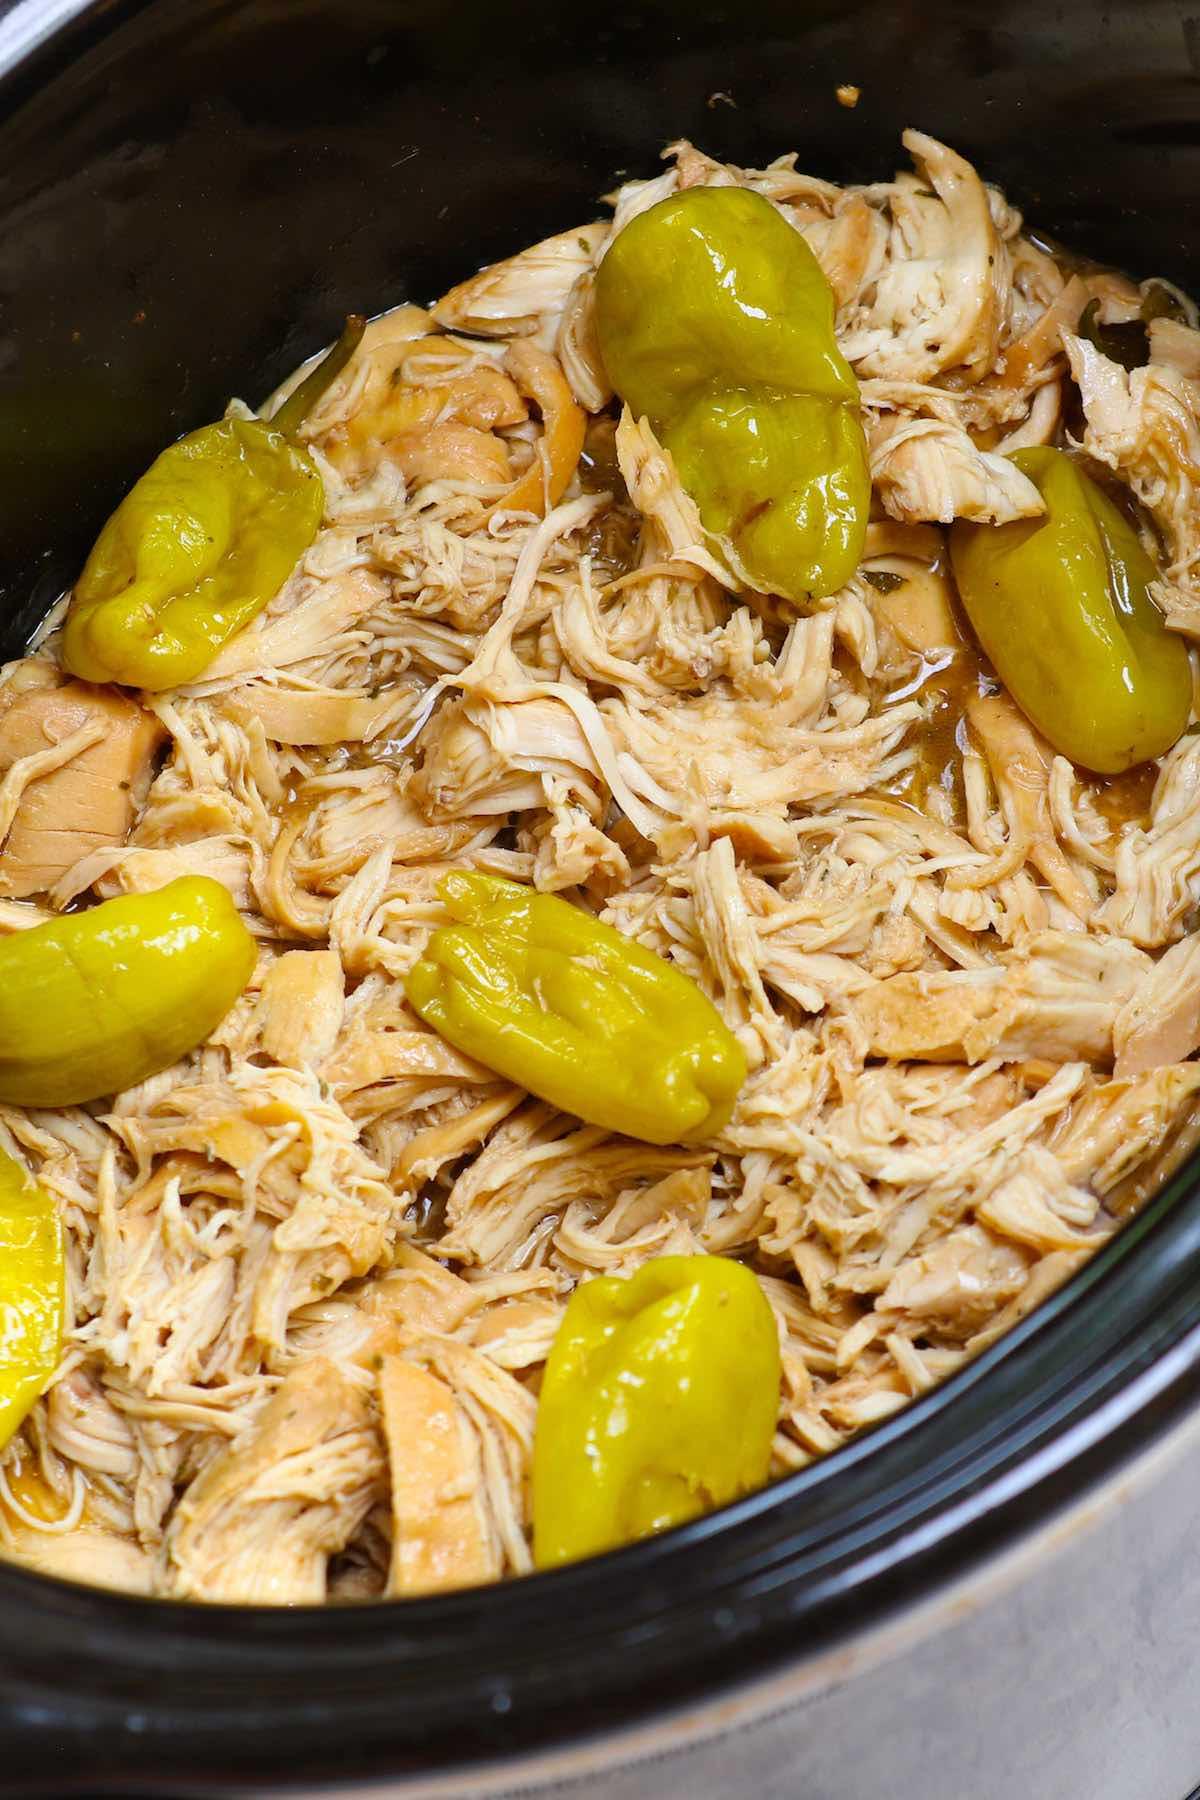 Shredded Mississippi Chicken in the crock pot